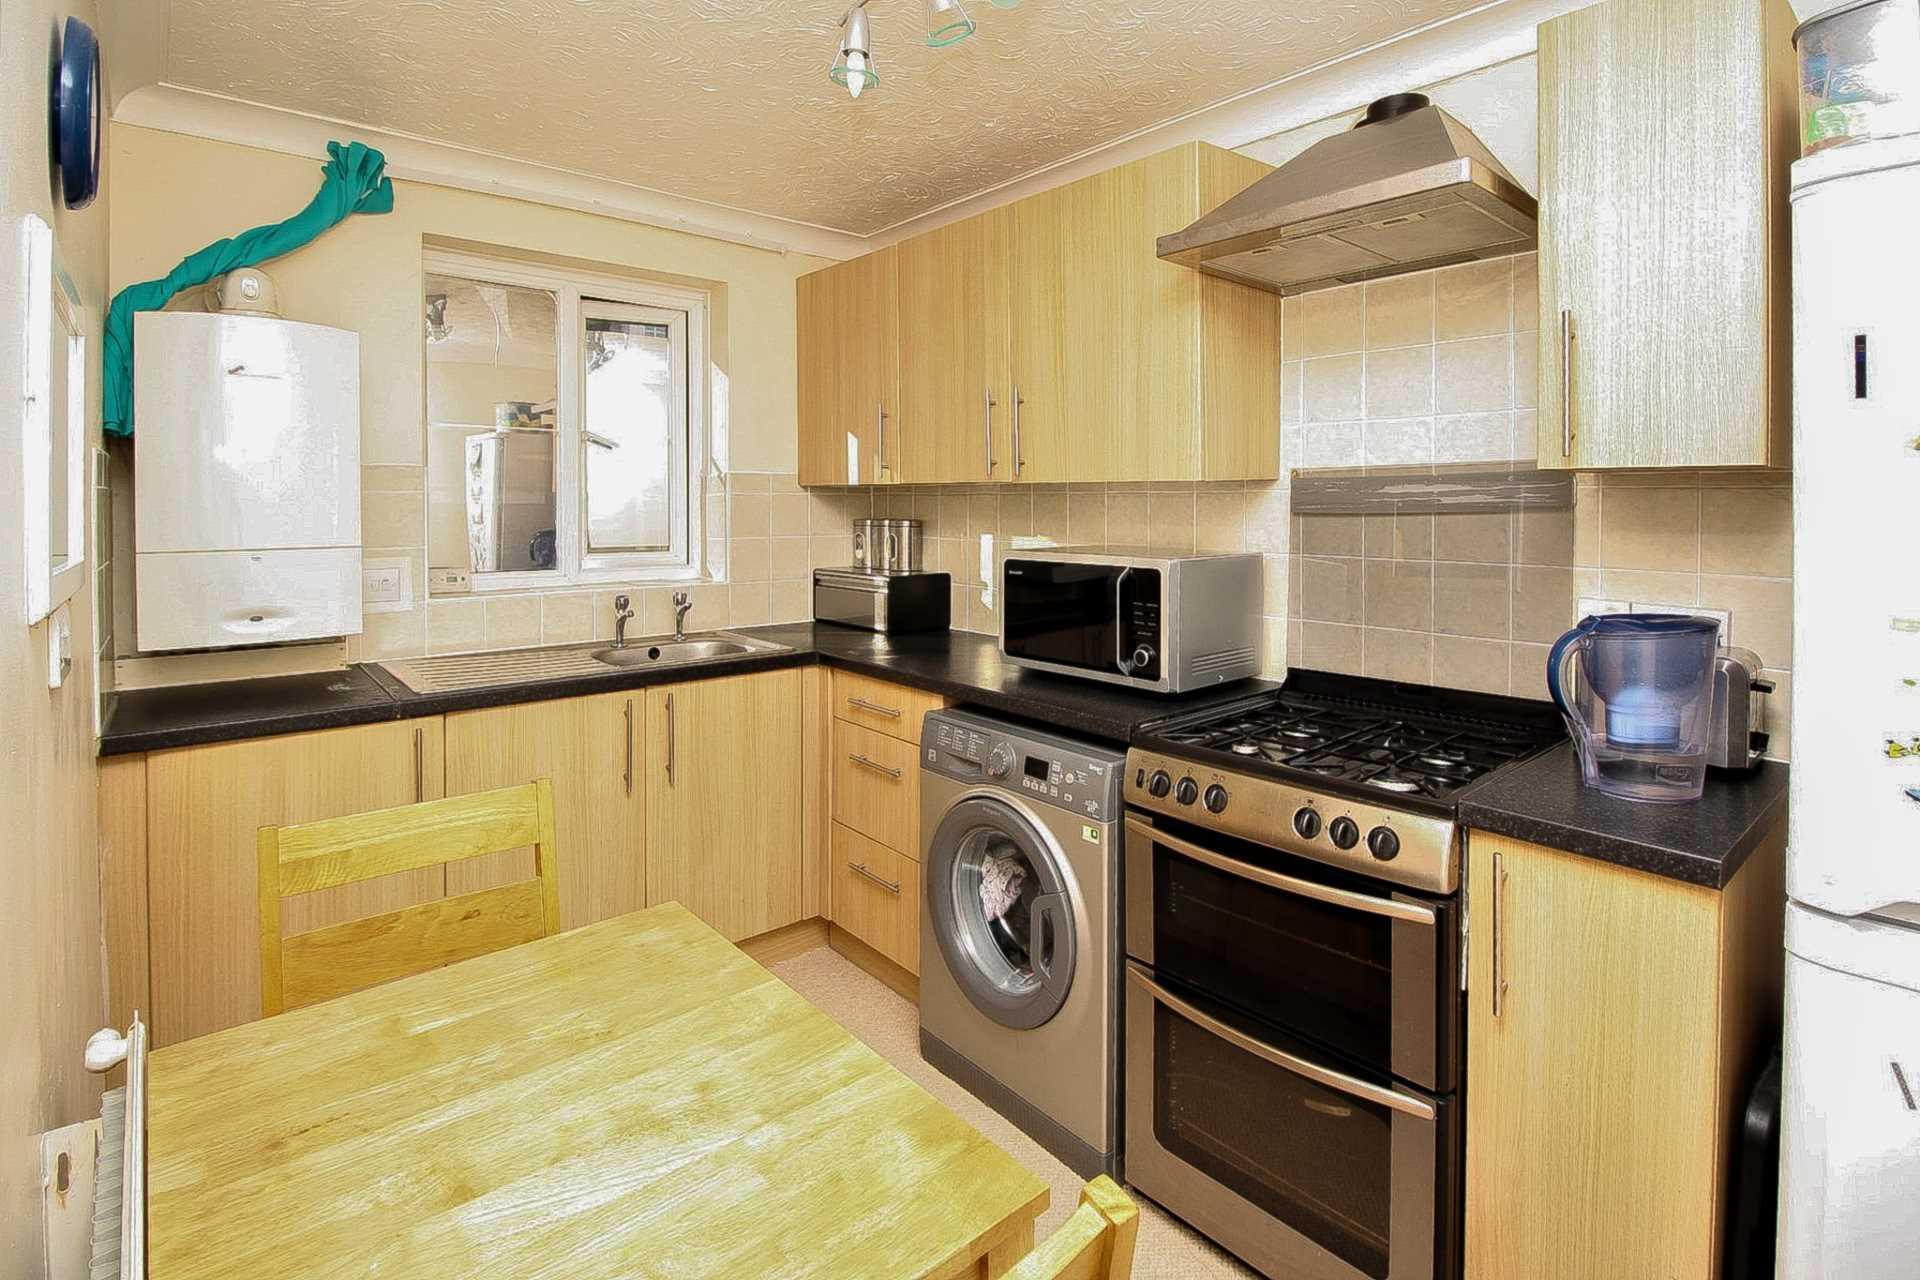 2 bed flat for sale in Dorset Mews, Dorset Street, Blandford Forum  - Property Image 2